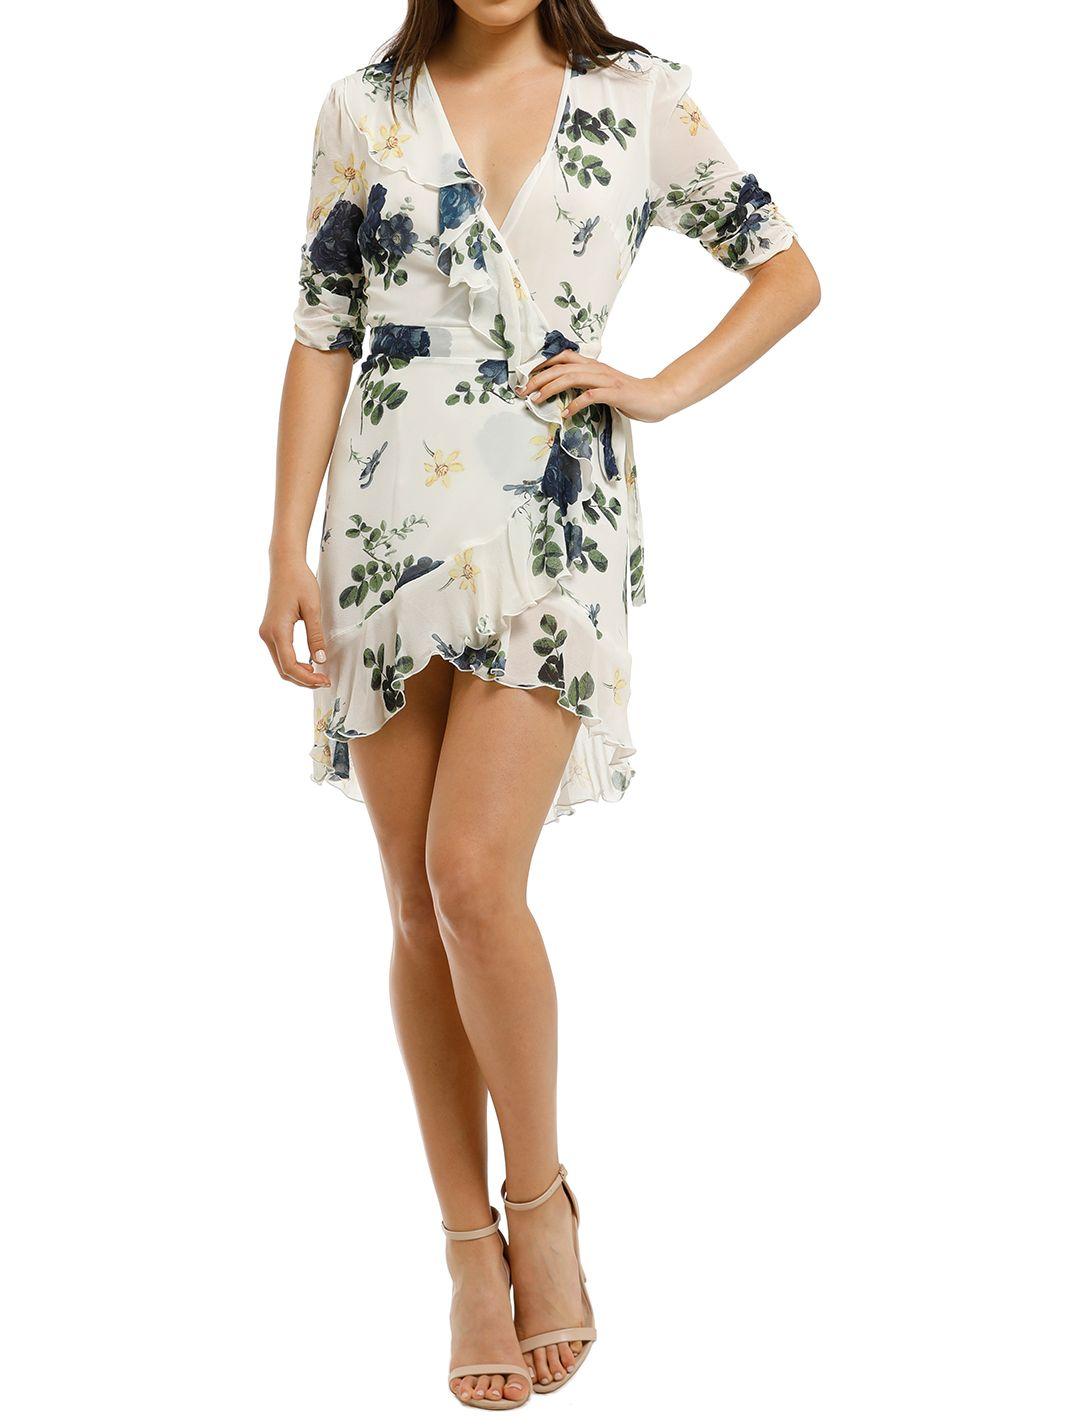 Nicholas the Label - Blue Rose Short Sleeve Wrap Dress - Ivory Floral - Front